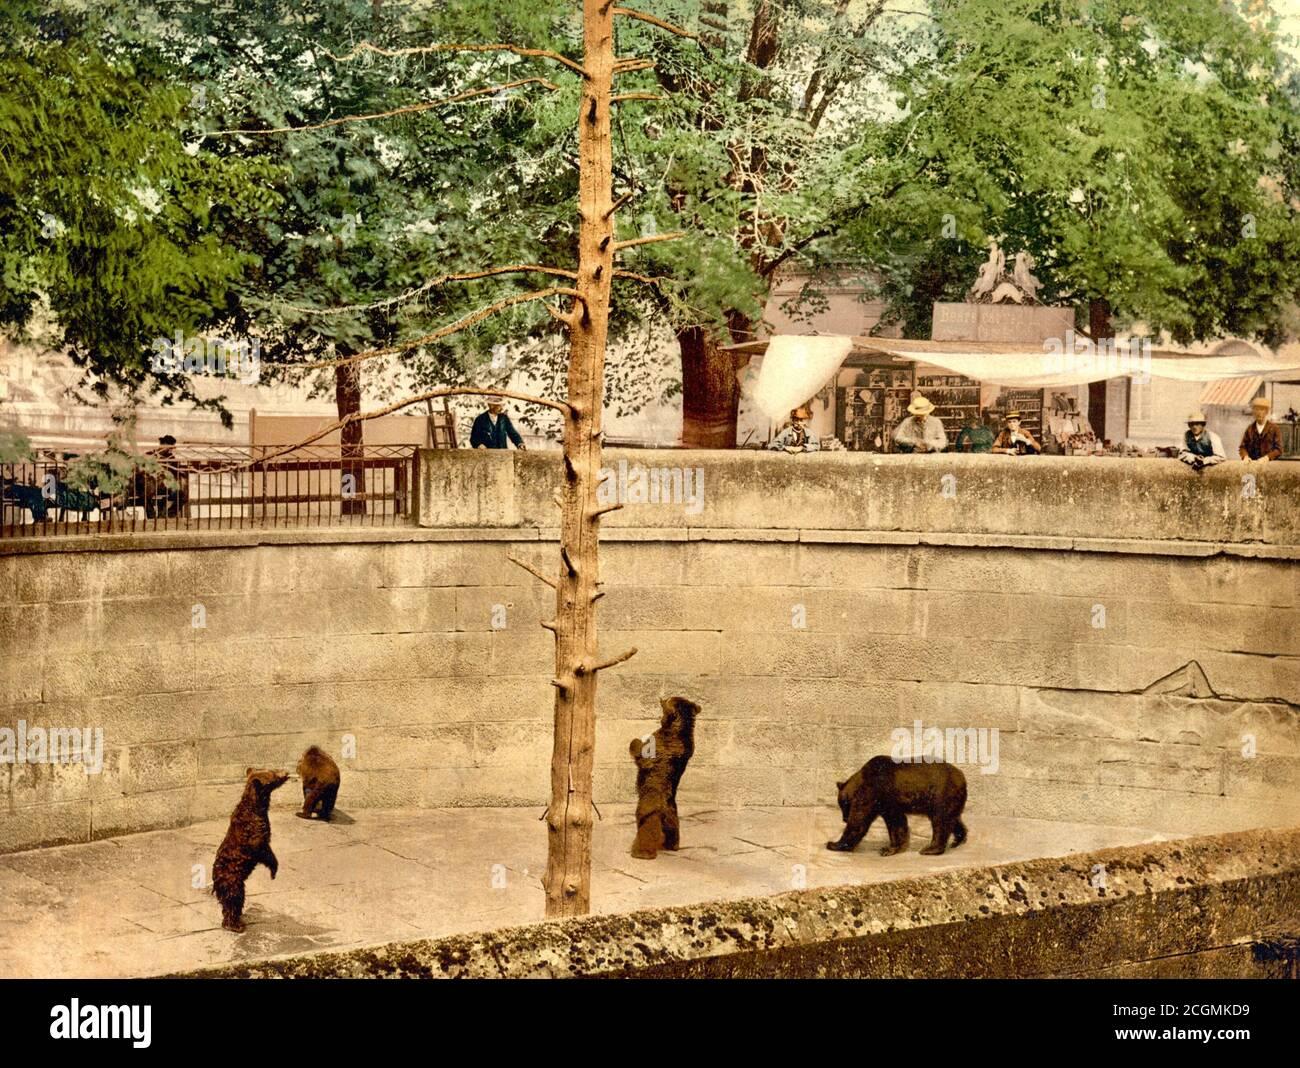 Bärengraben, bear pit, Bern, Switzerland 1890. Stock Photo